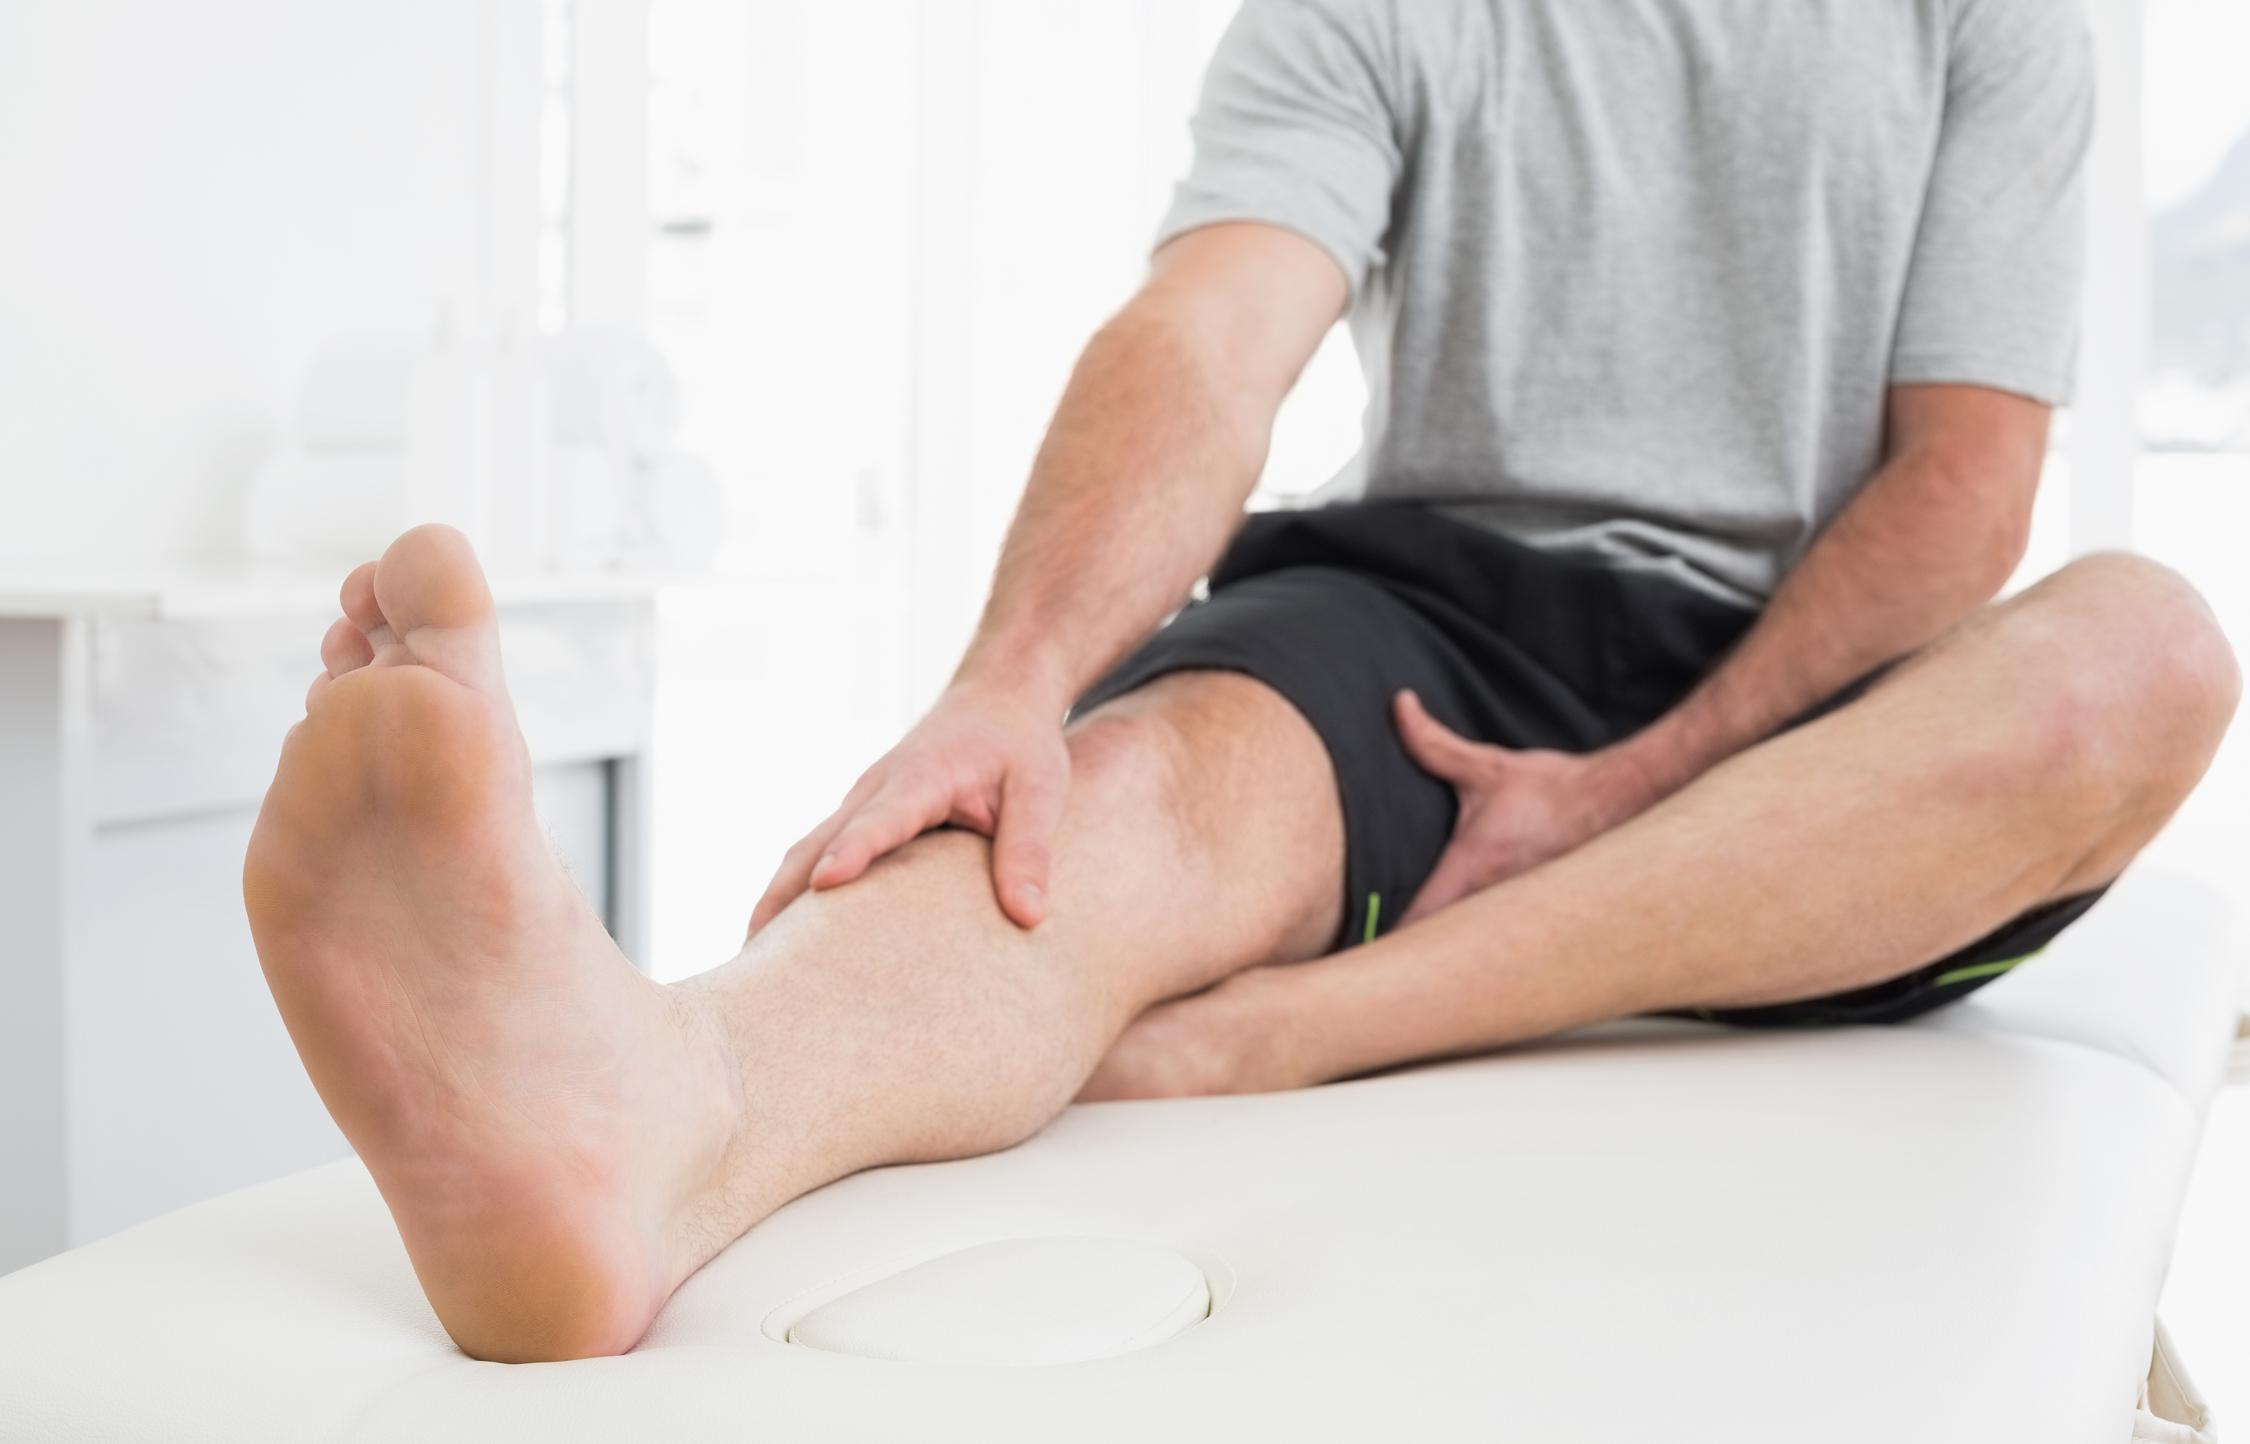 Man holding elevated leg pain